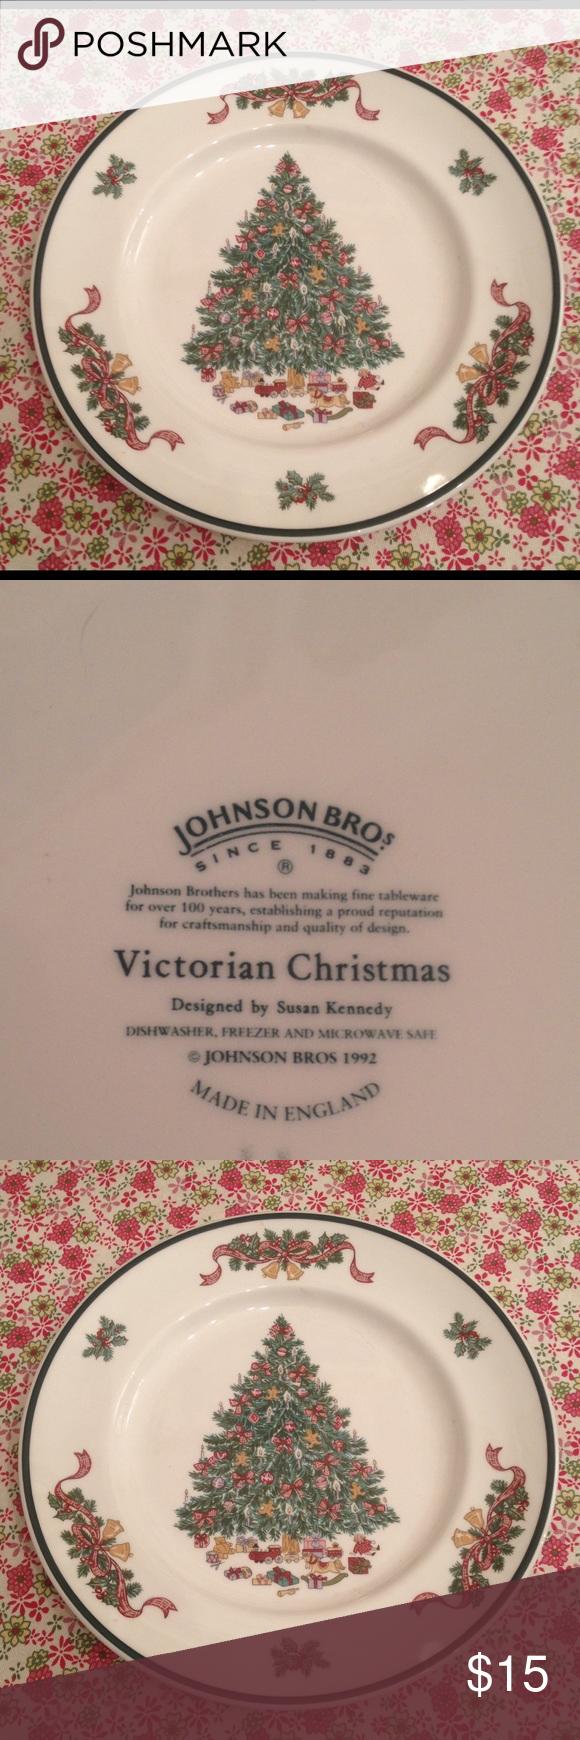 Johnson Brothers Victorian Christmas plate | Pinterest | Victorian ...